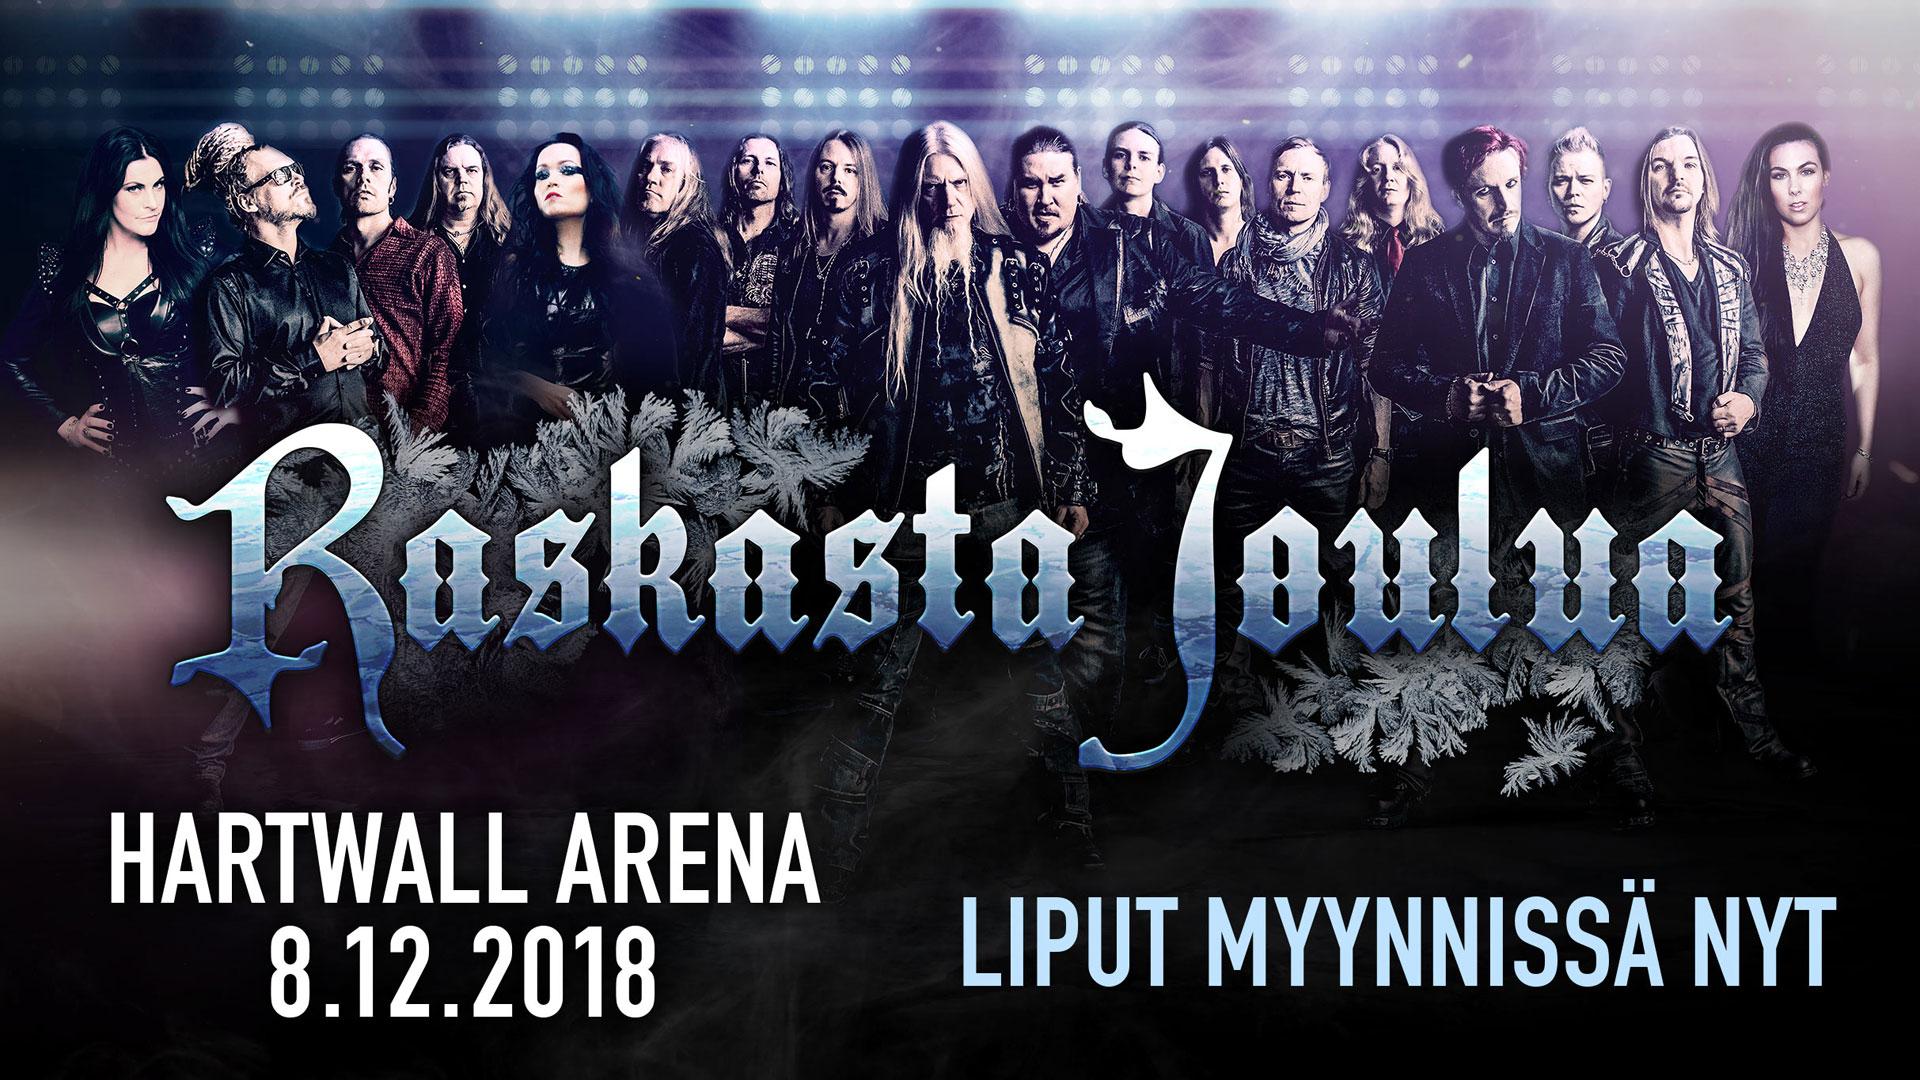 raskas joulu 2018 Raskasta Joulua  konsertti 2018 | My Helsinki raskas joulu 2018